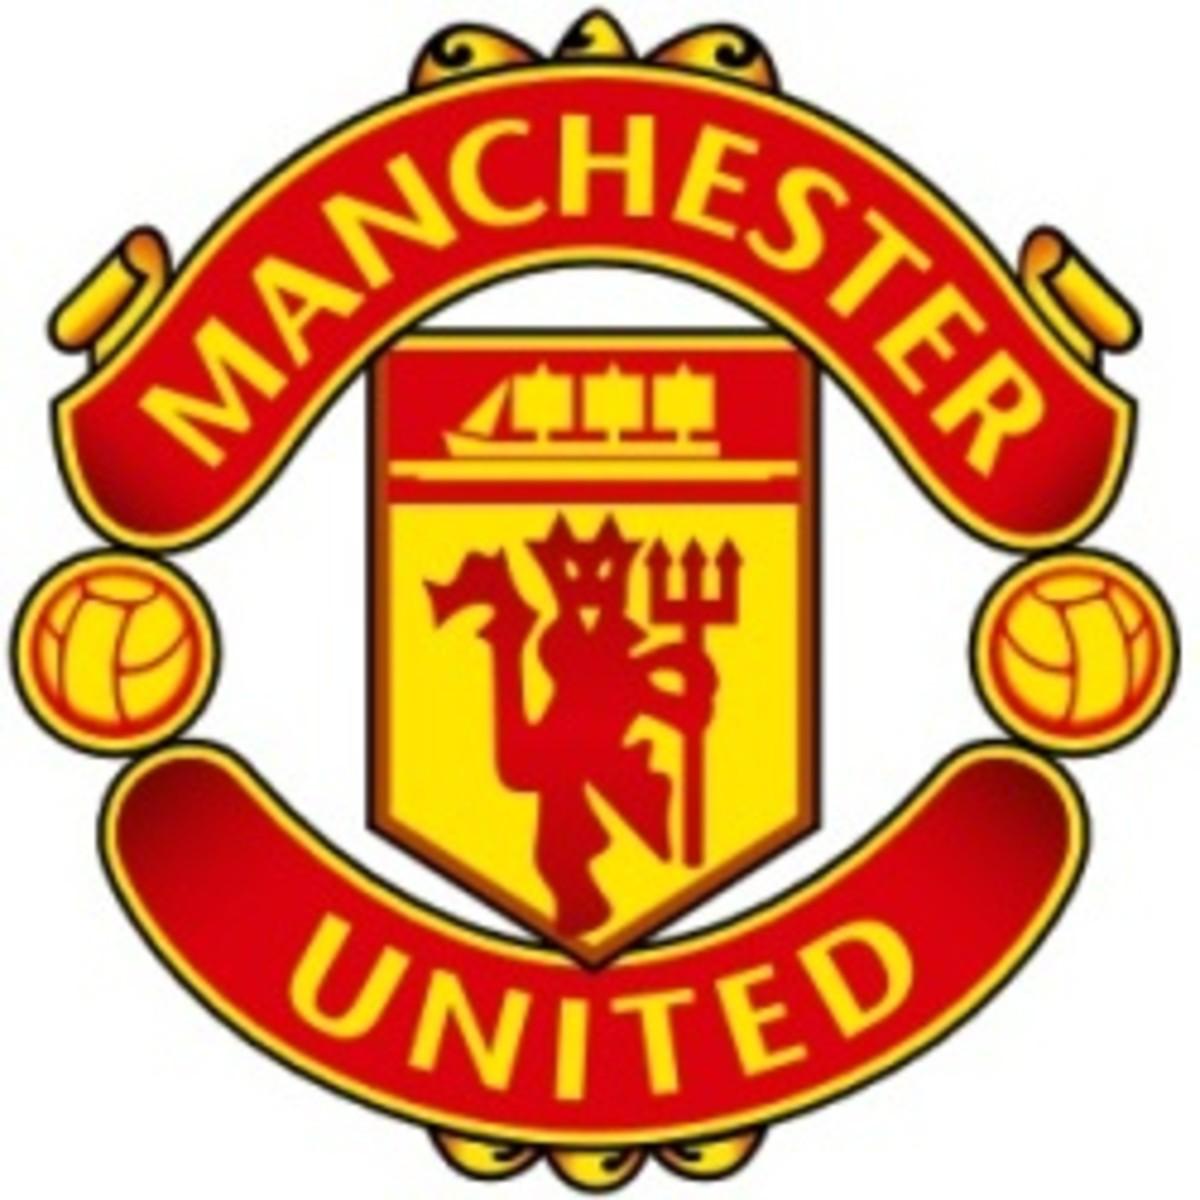 Manchester United Football Club Crest